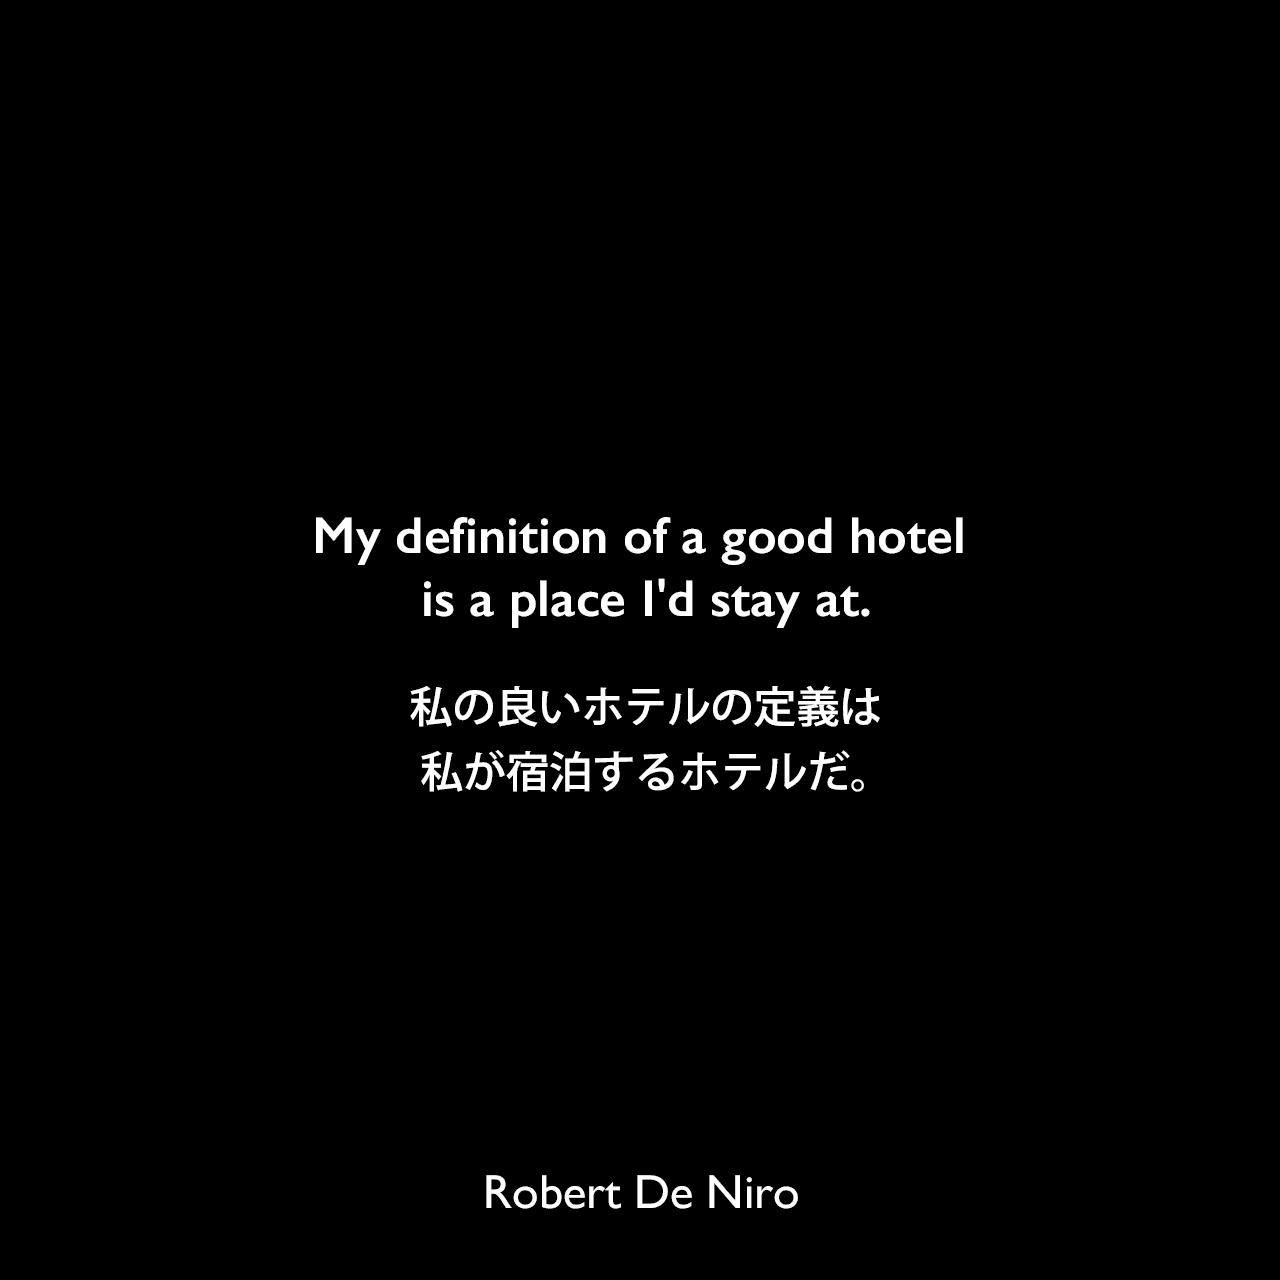 My definition of a good hotel is a place I'd stay at.私の良いホテルの定義は、私が宿泊するホテルだ。Robert De Niro